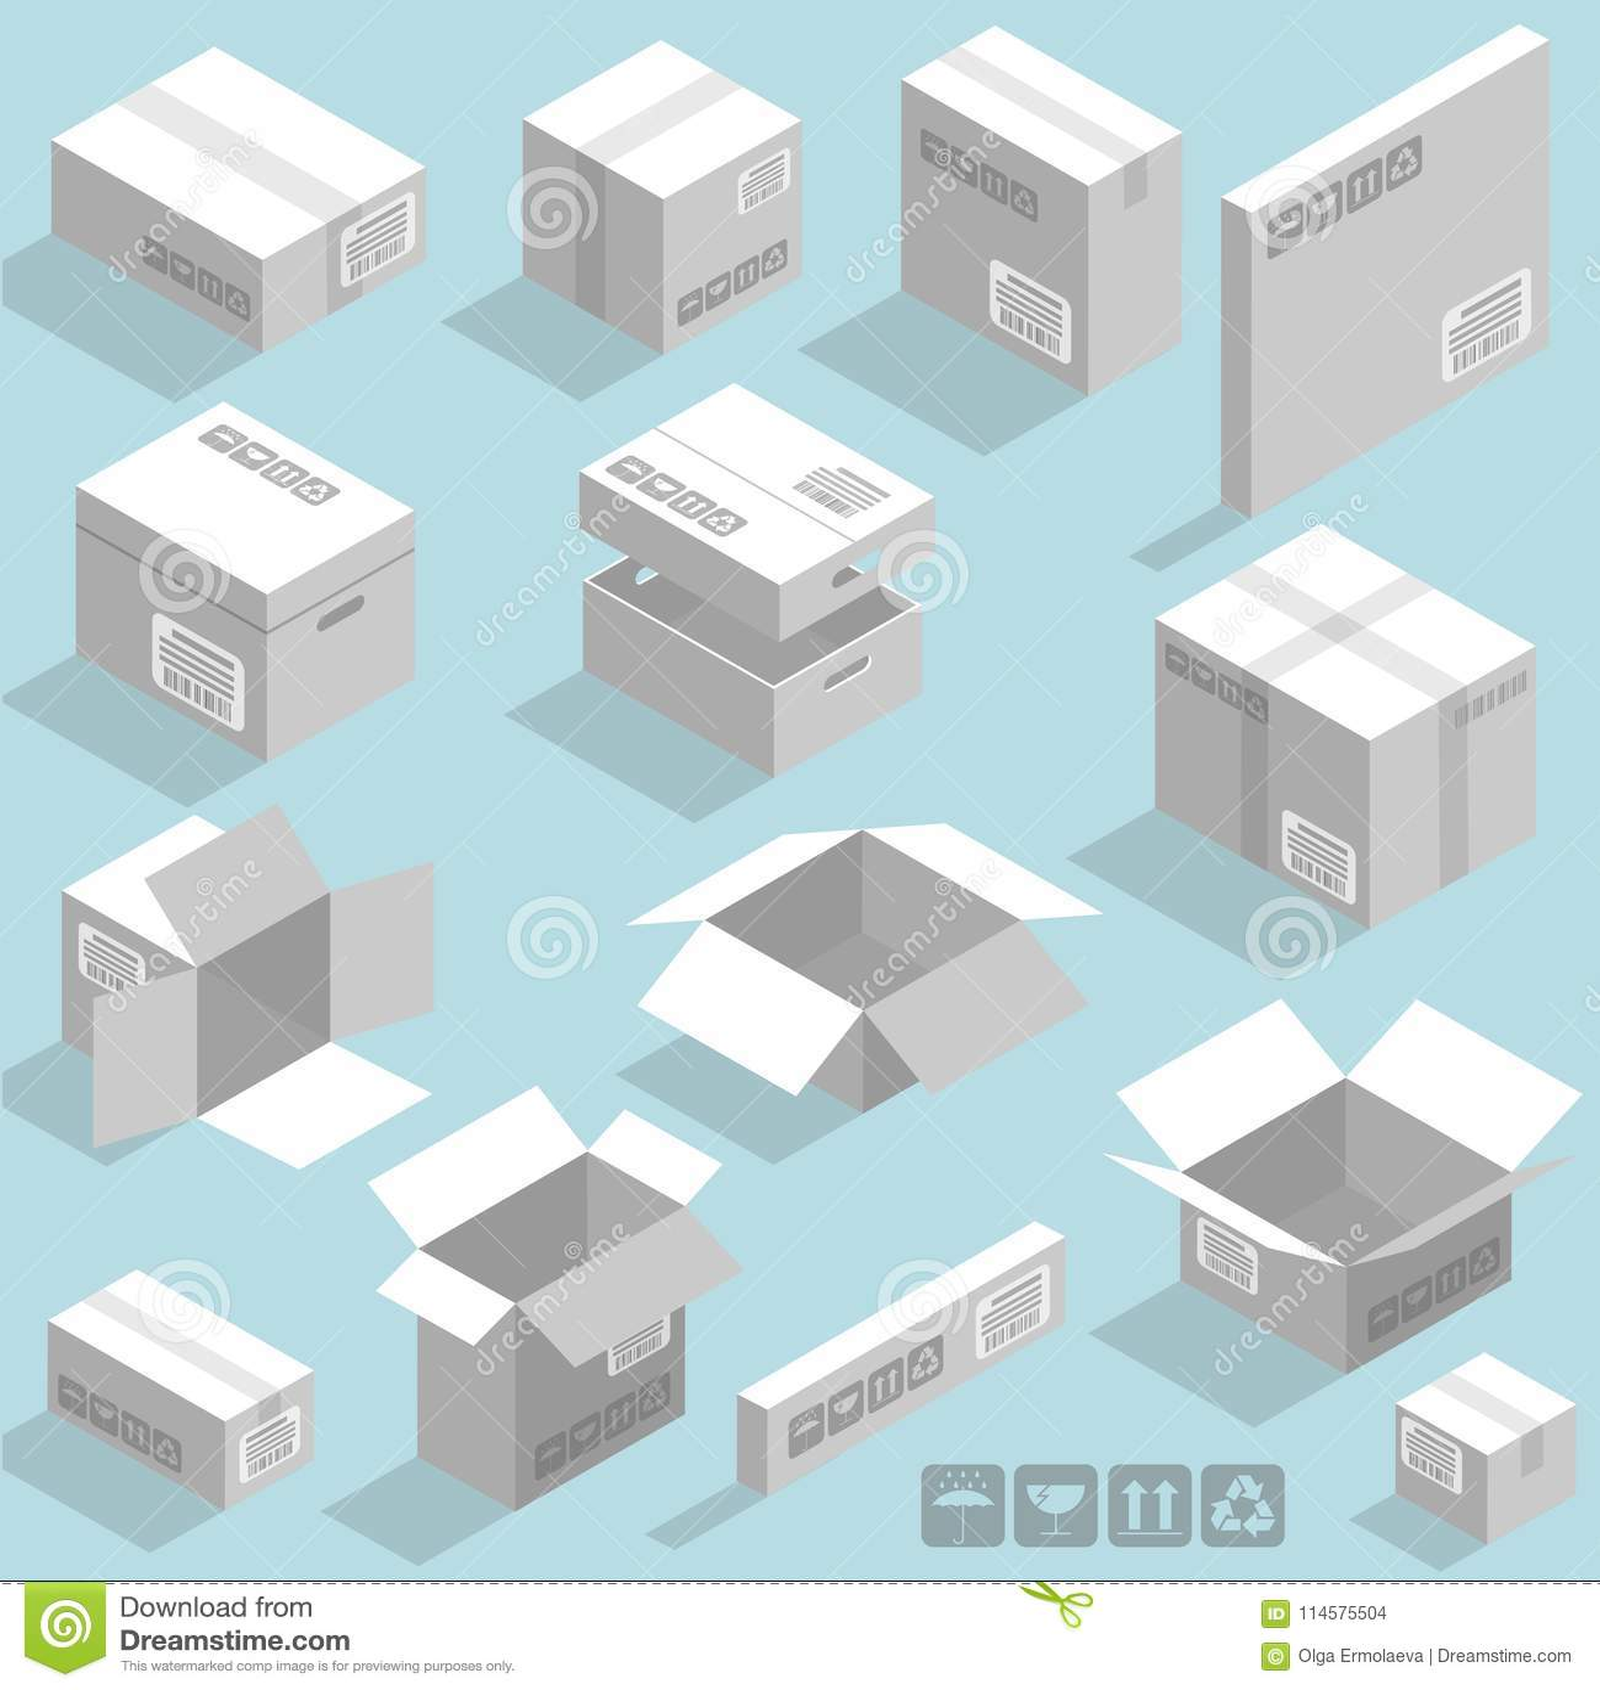 Isometric vector cardboard boxes stock vector illustration of isometric vector cardboard white boxes templates vector design element set maxwellsz